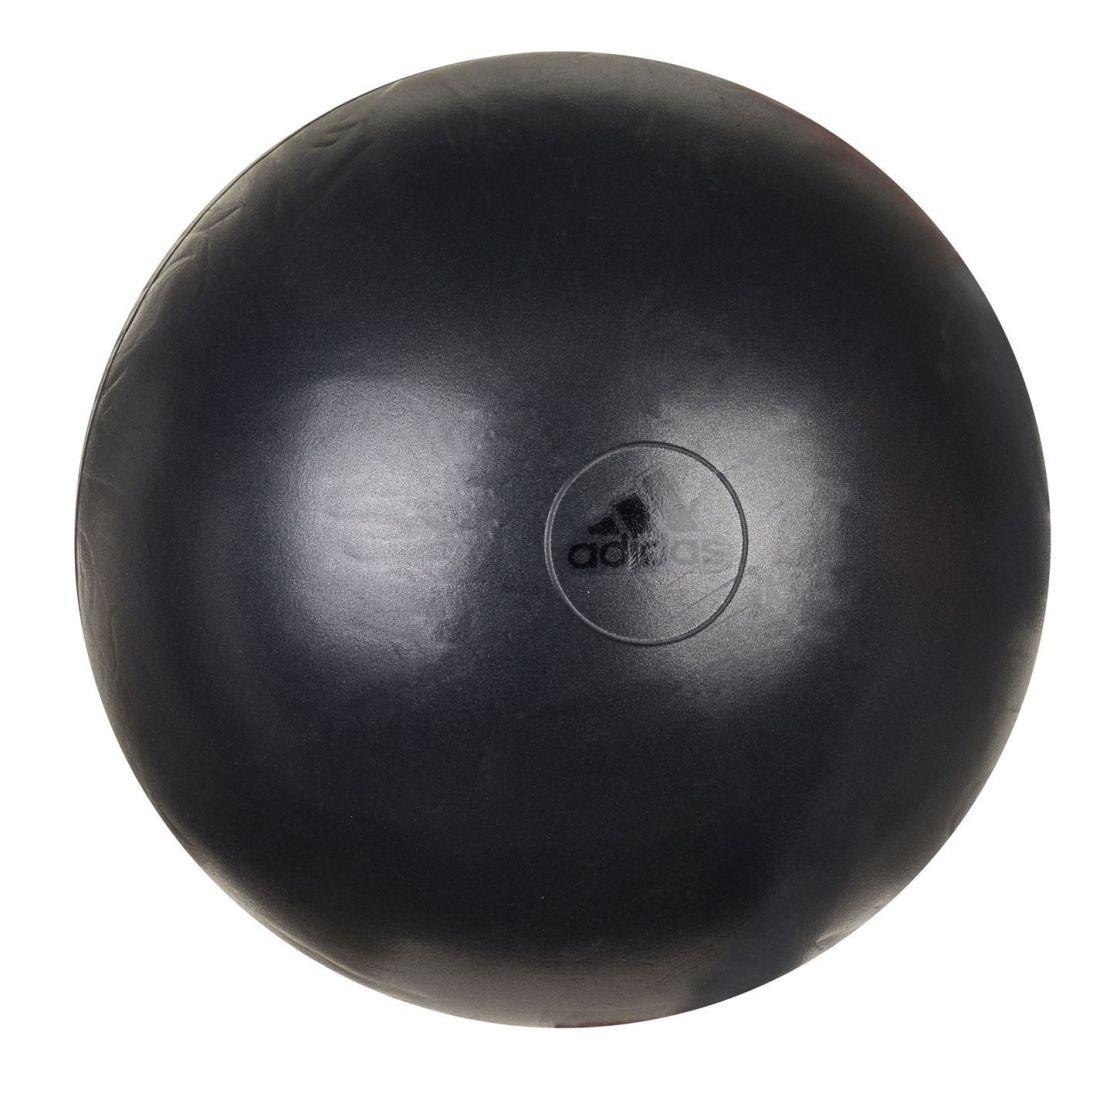 LOT OF 5 x GYM BALLS 65CM GREY EXERCISE SWISS YOGA FITNESS BALL